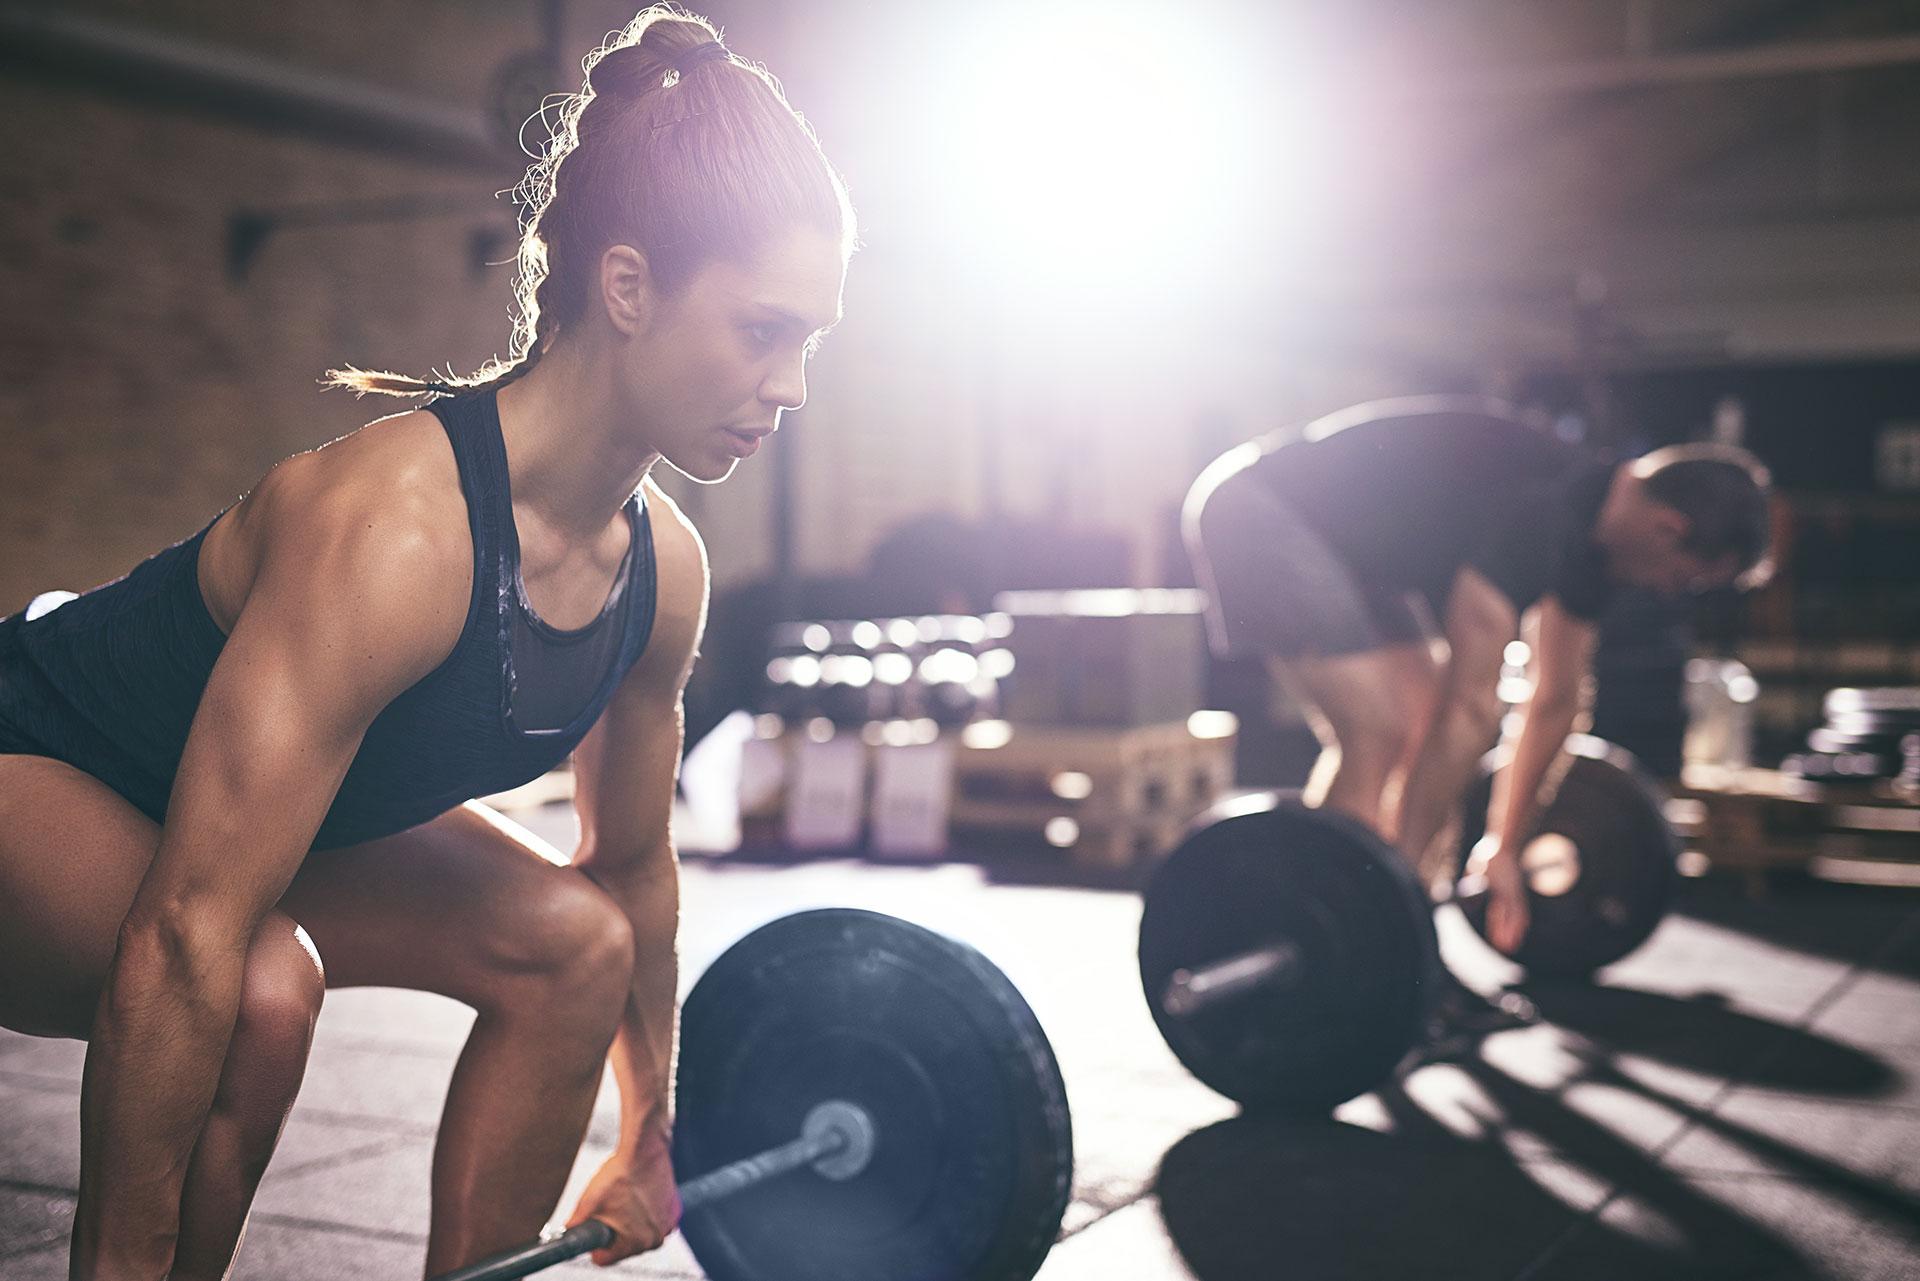 Woman lifting heavy barbells